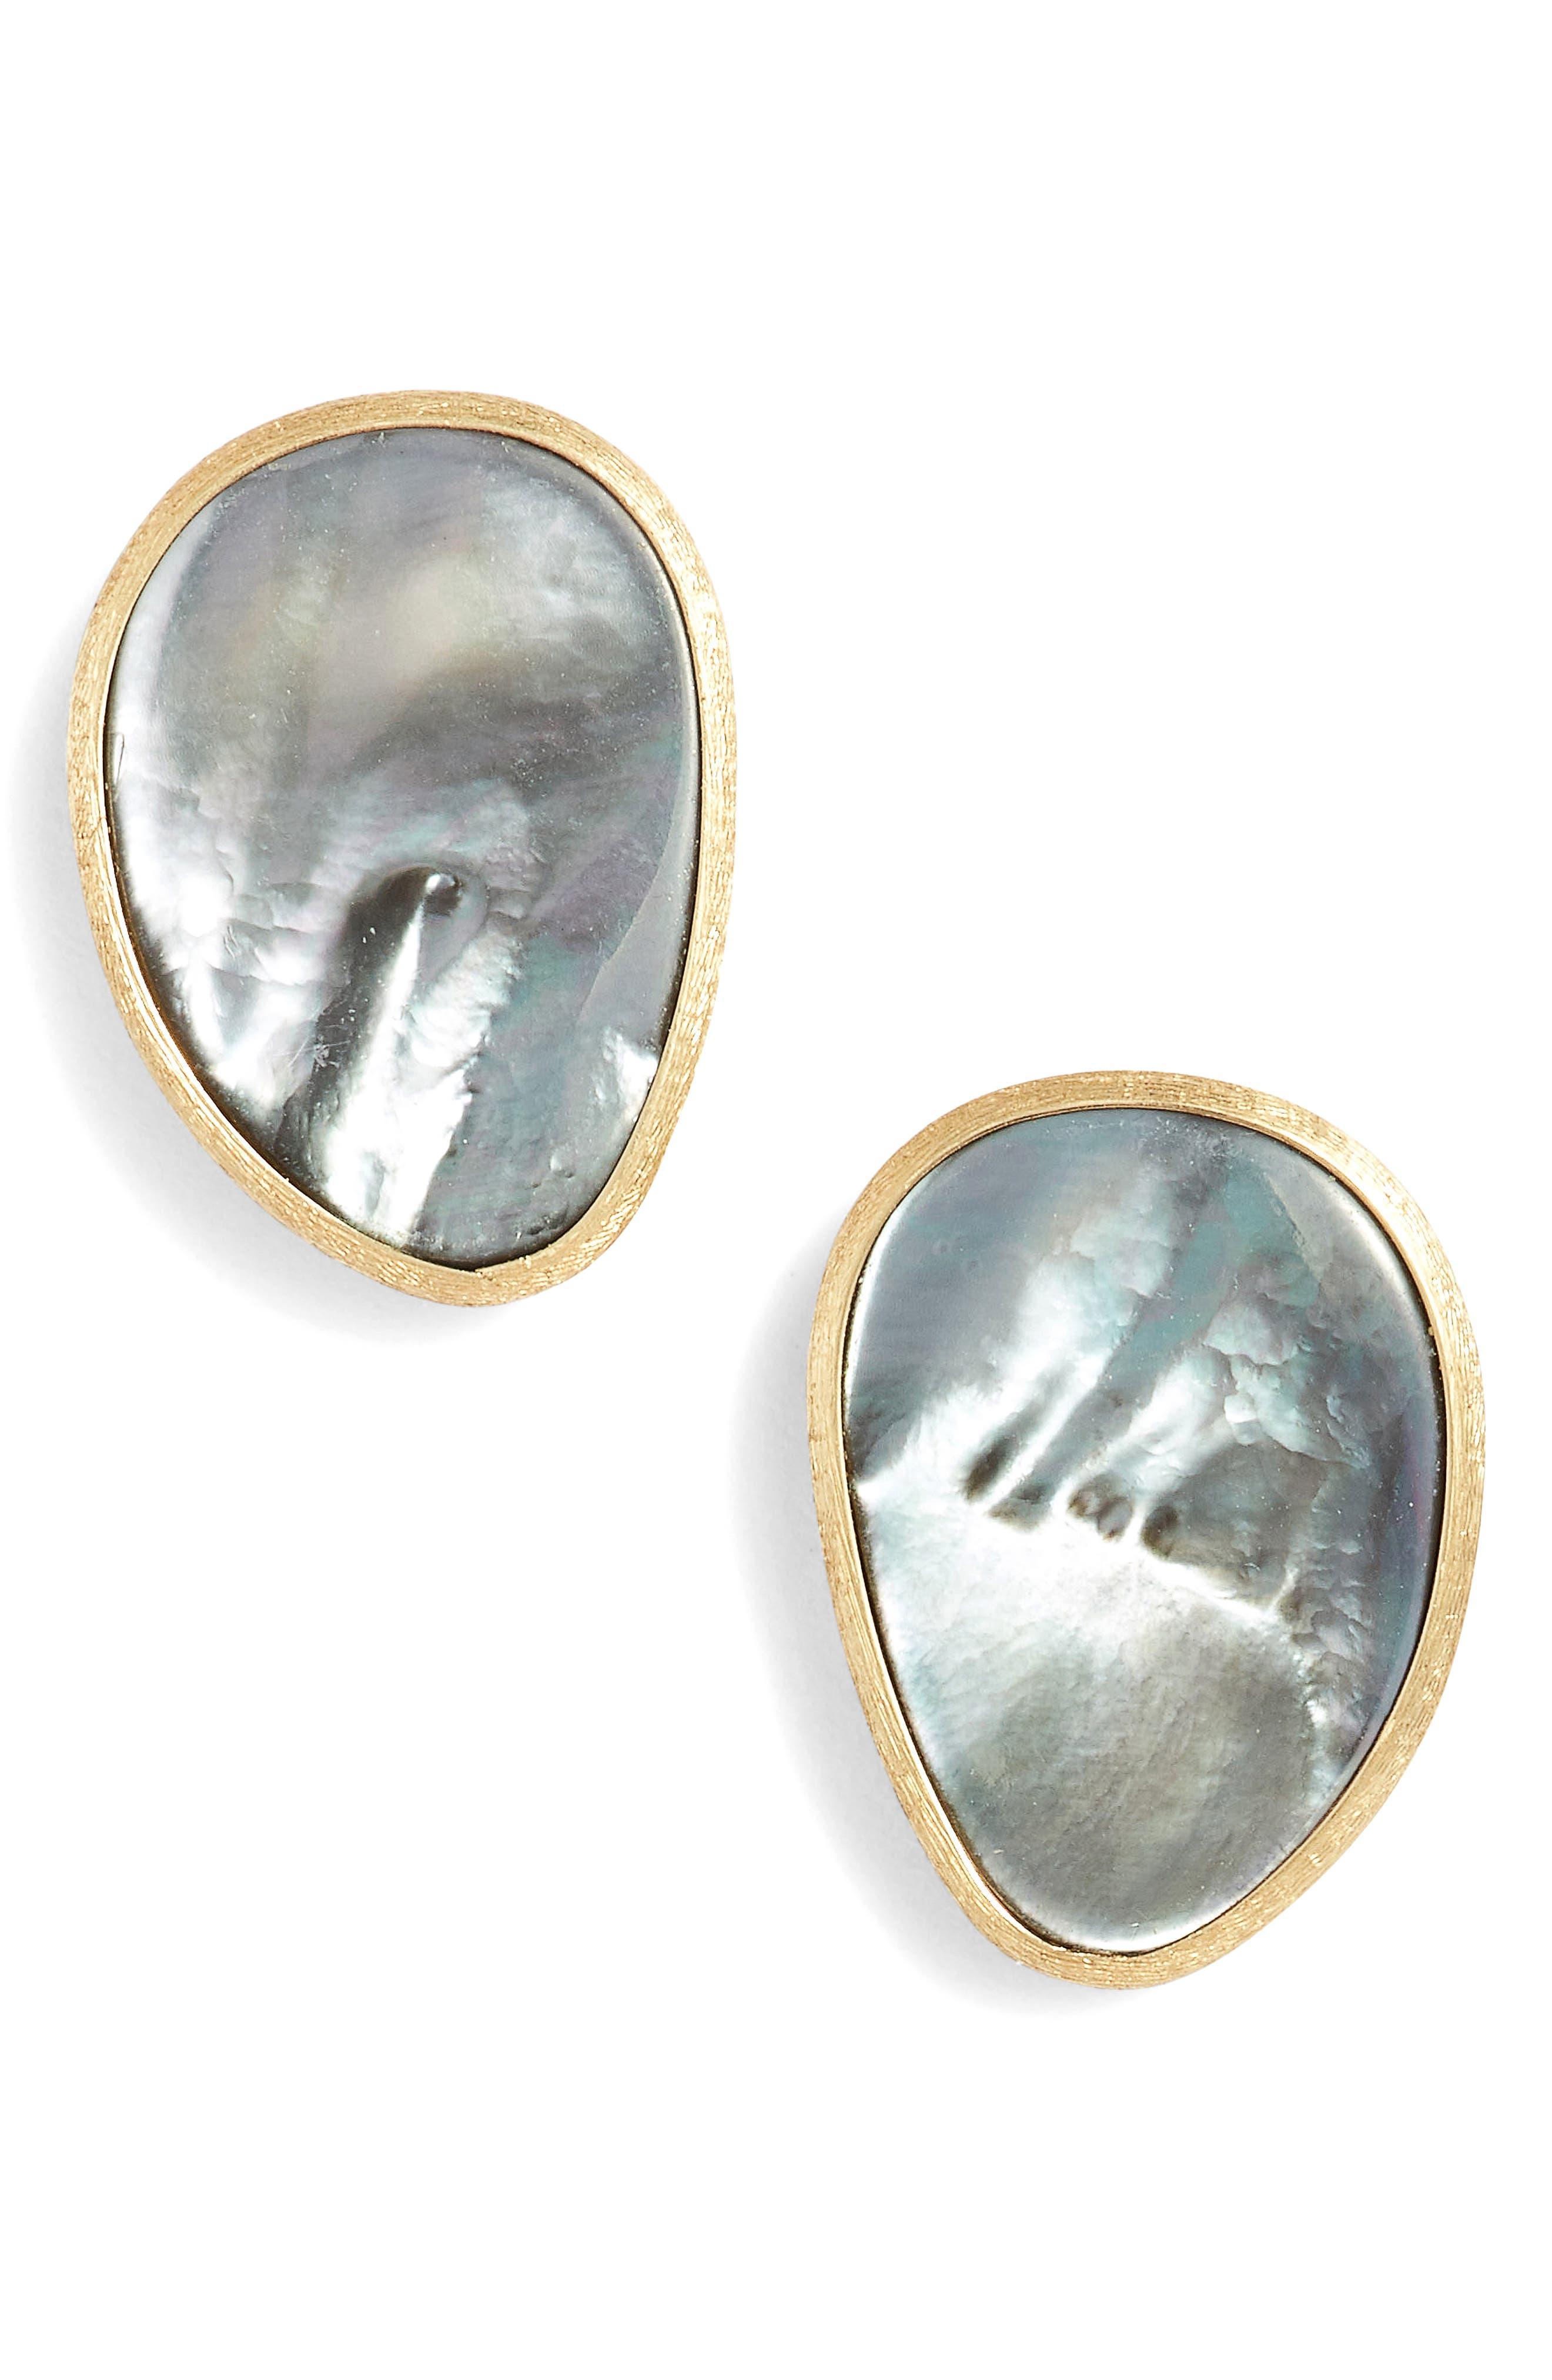 Lunaria Pearl Stud Earrings,                         Main,                         color, GREY MOTHER OF PEARL